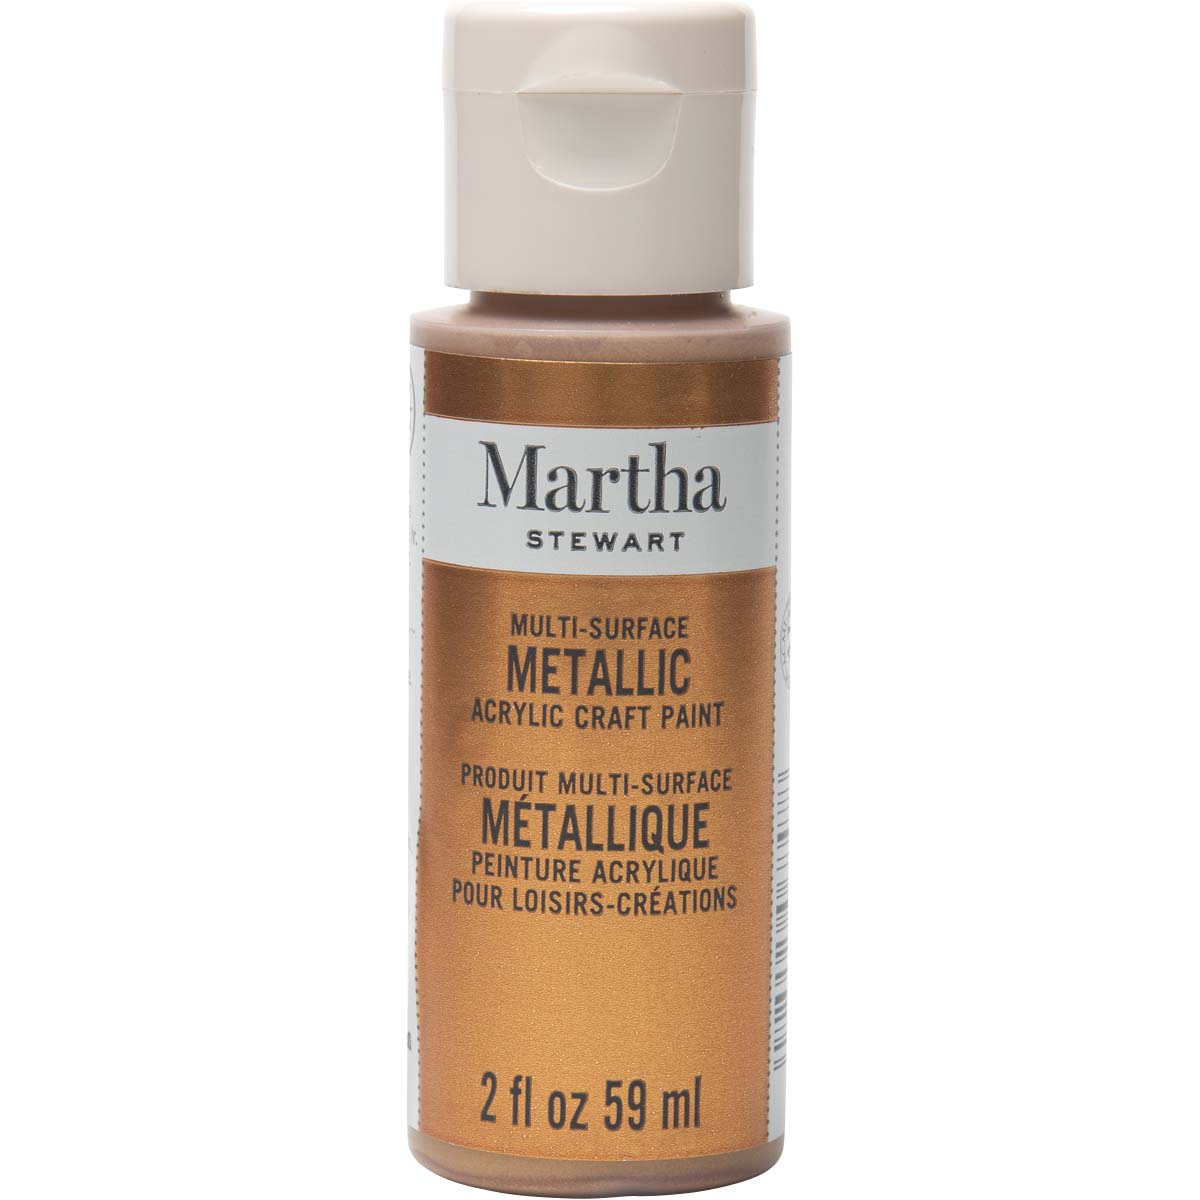 Martha Stewart® 2oz Multi-Surface Metallic Acrylic Craft Paint - Copper